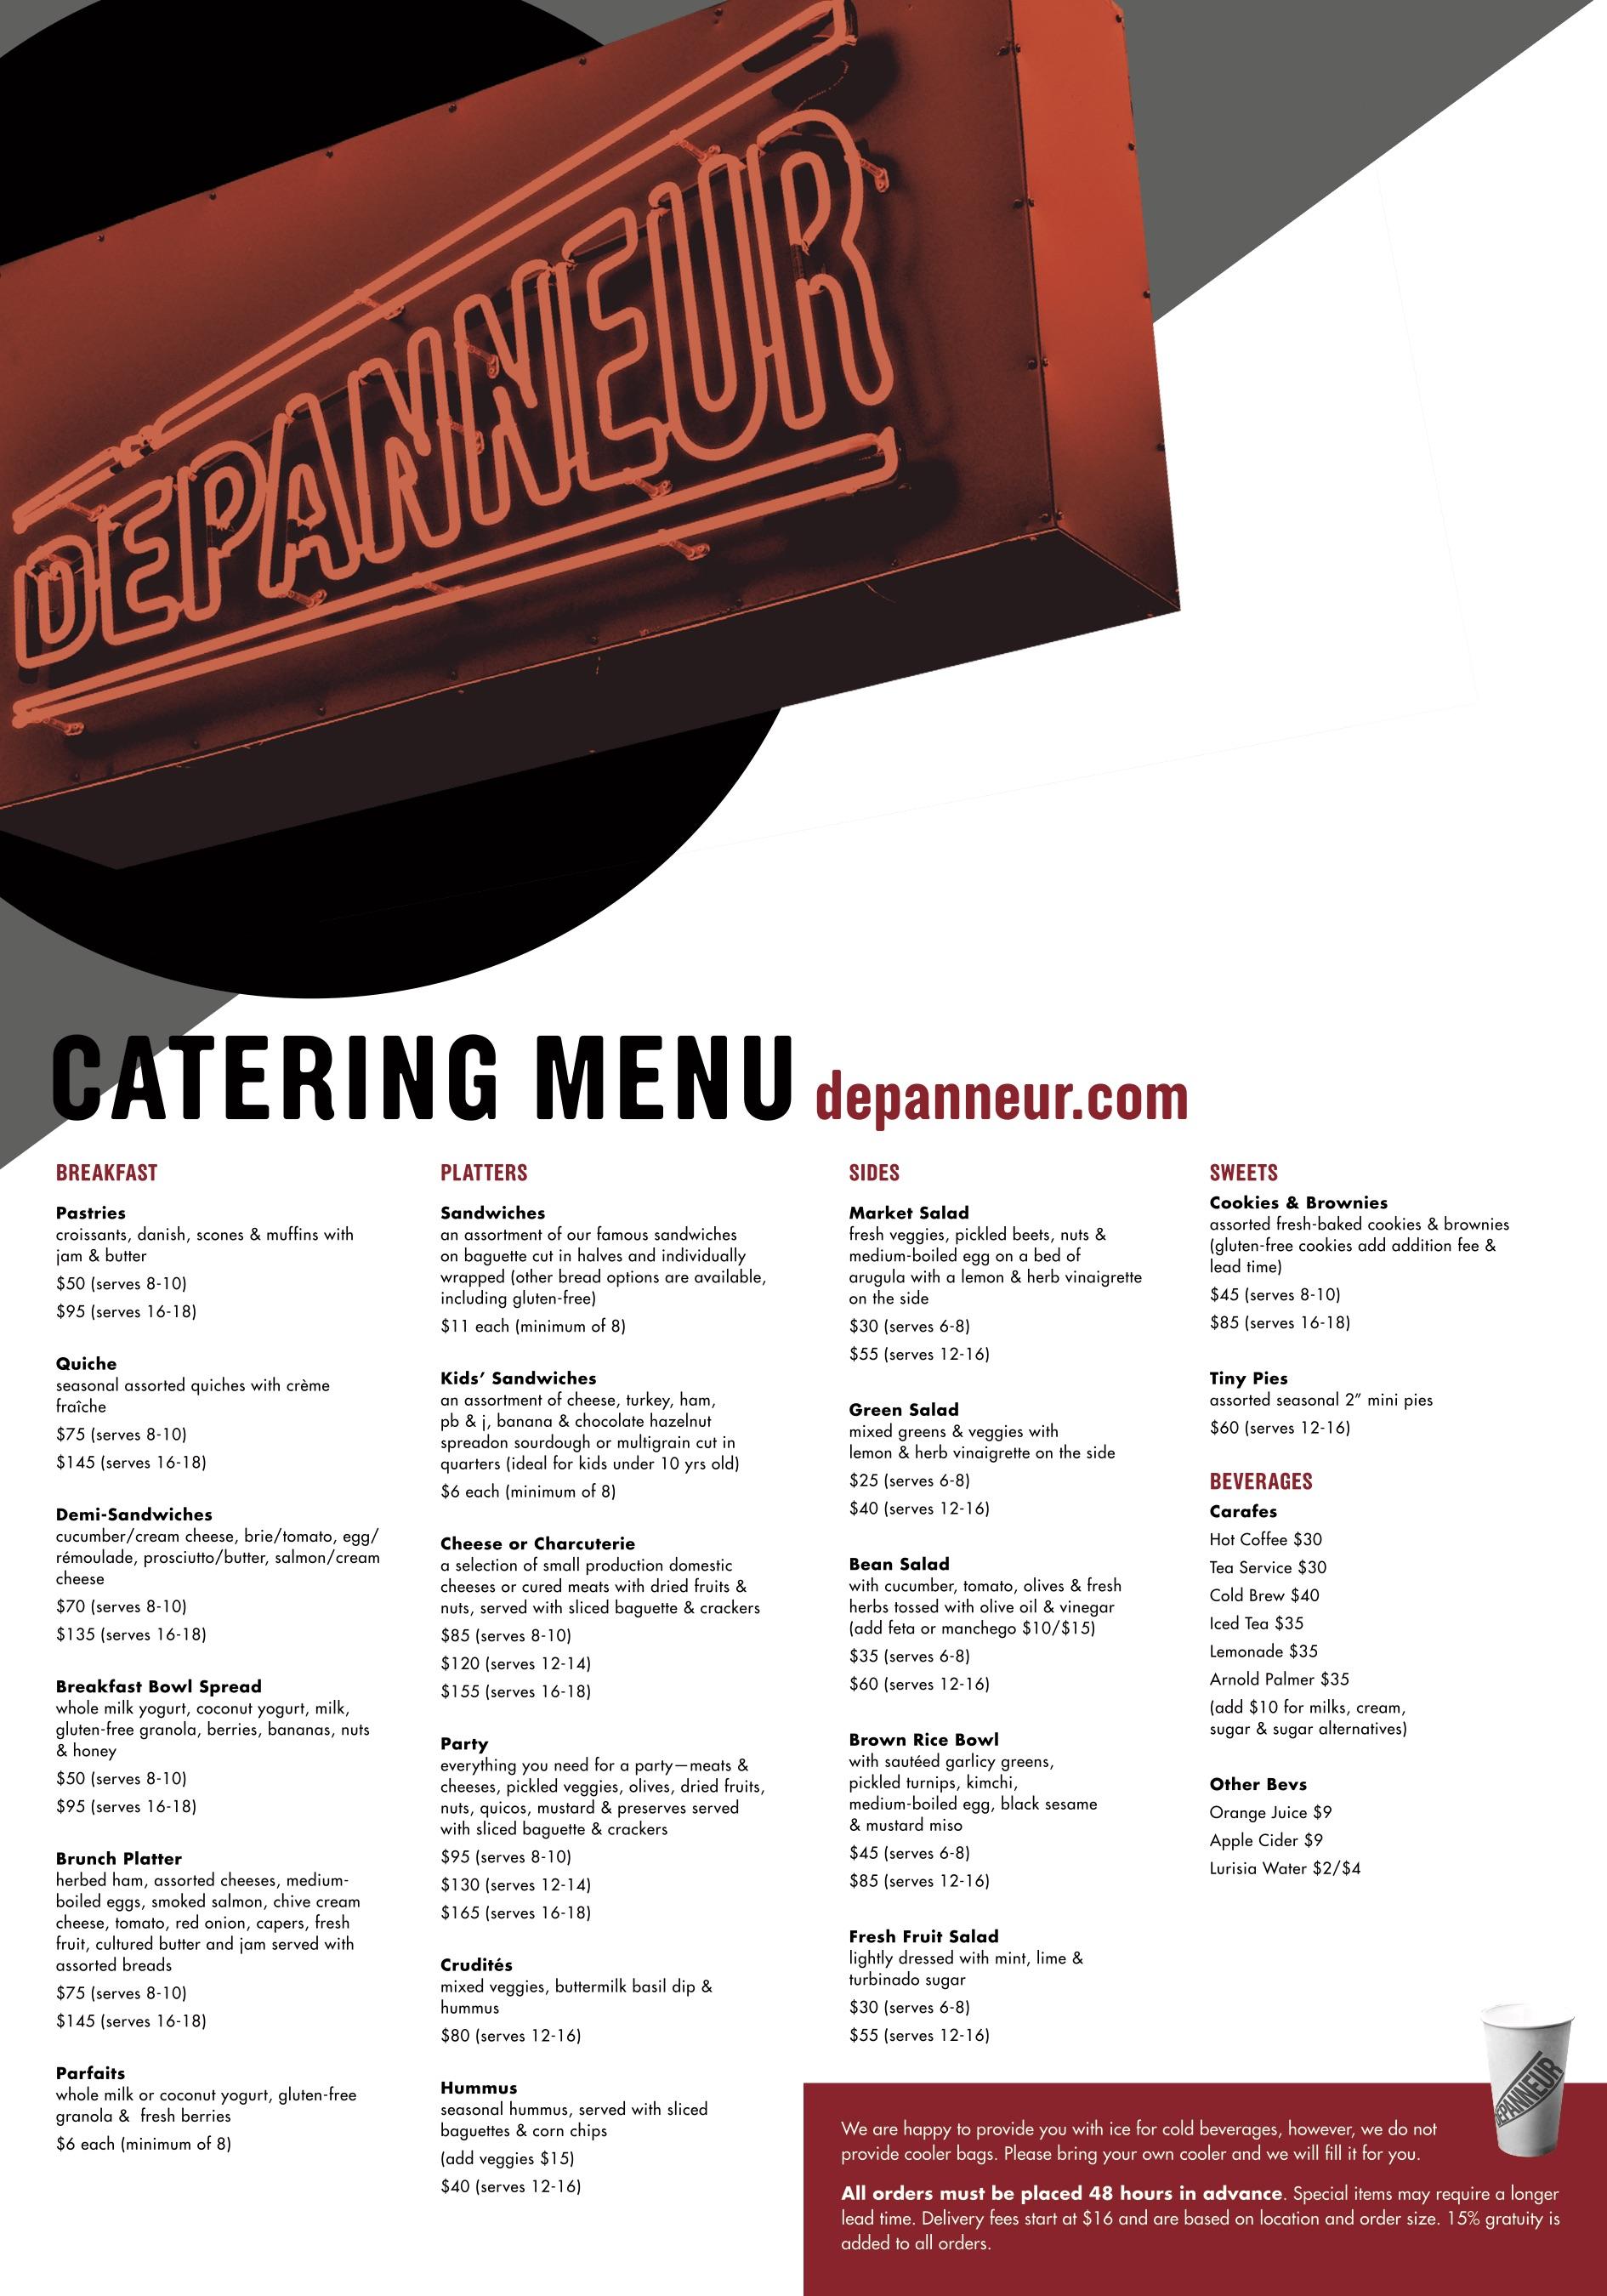 Dépanneur fold out menu (dragged) copy.jpg